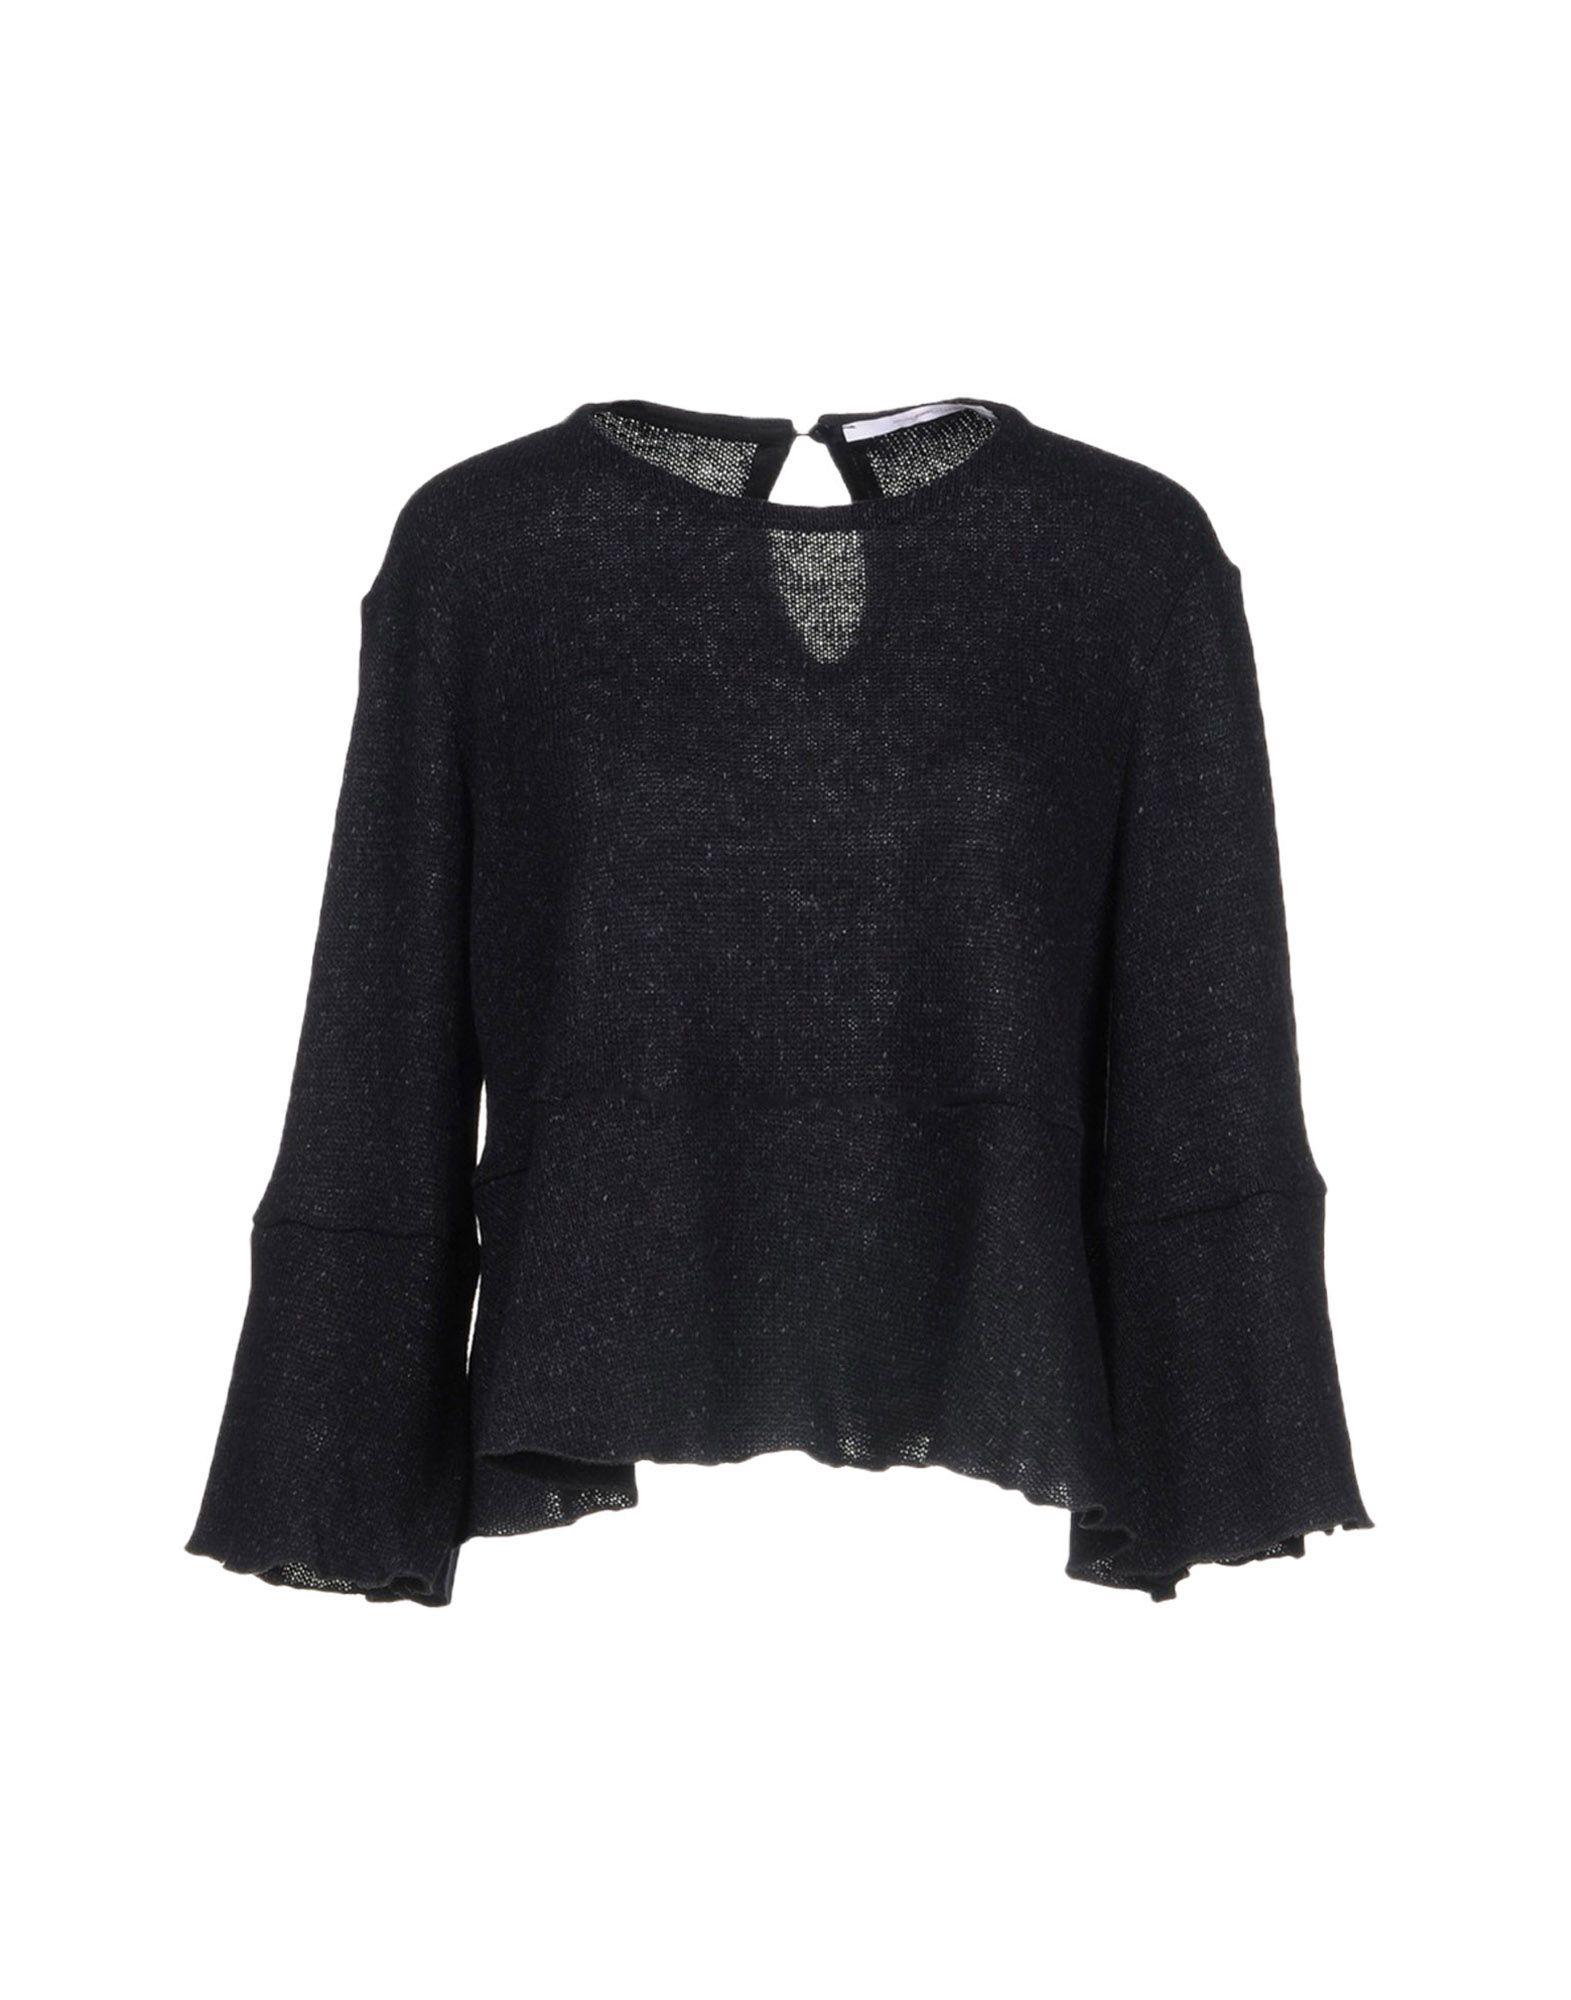 Pullover Maison Laviniaturra Donna - Acquista online su adGFV83H